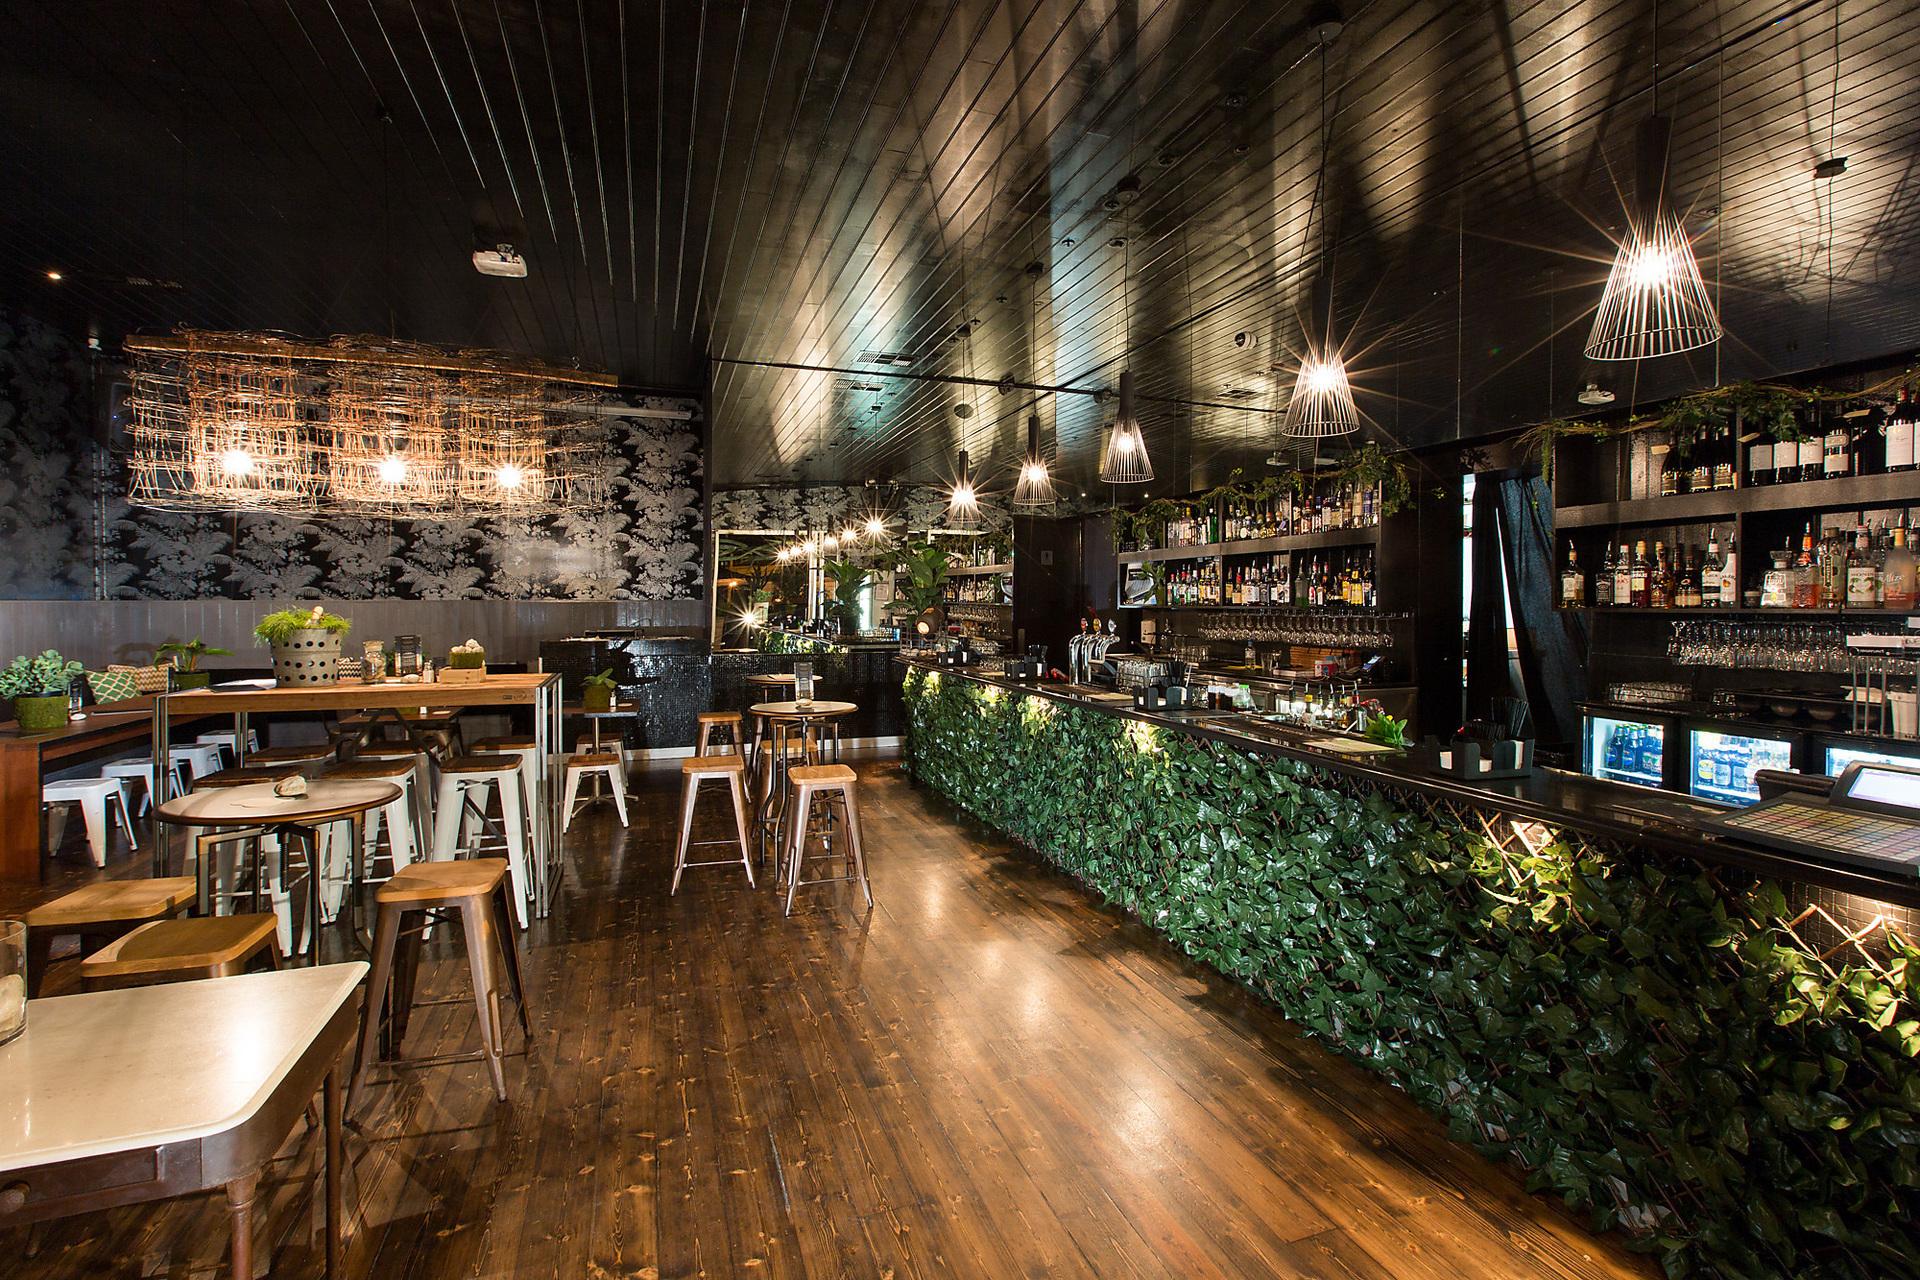 h - Metropol Bar